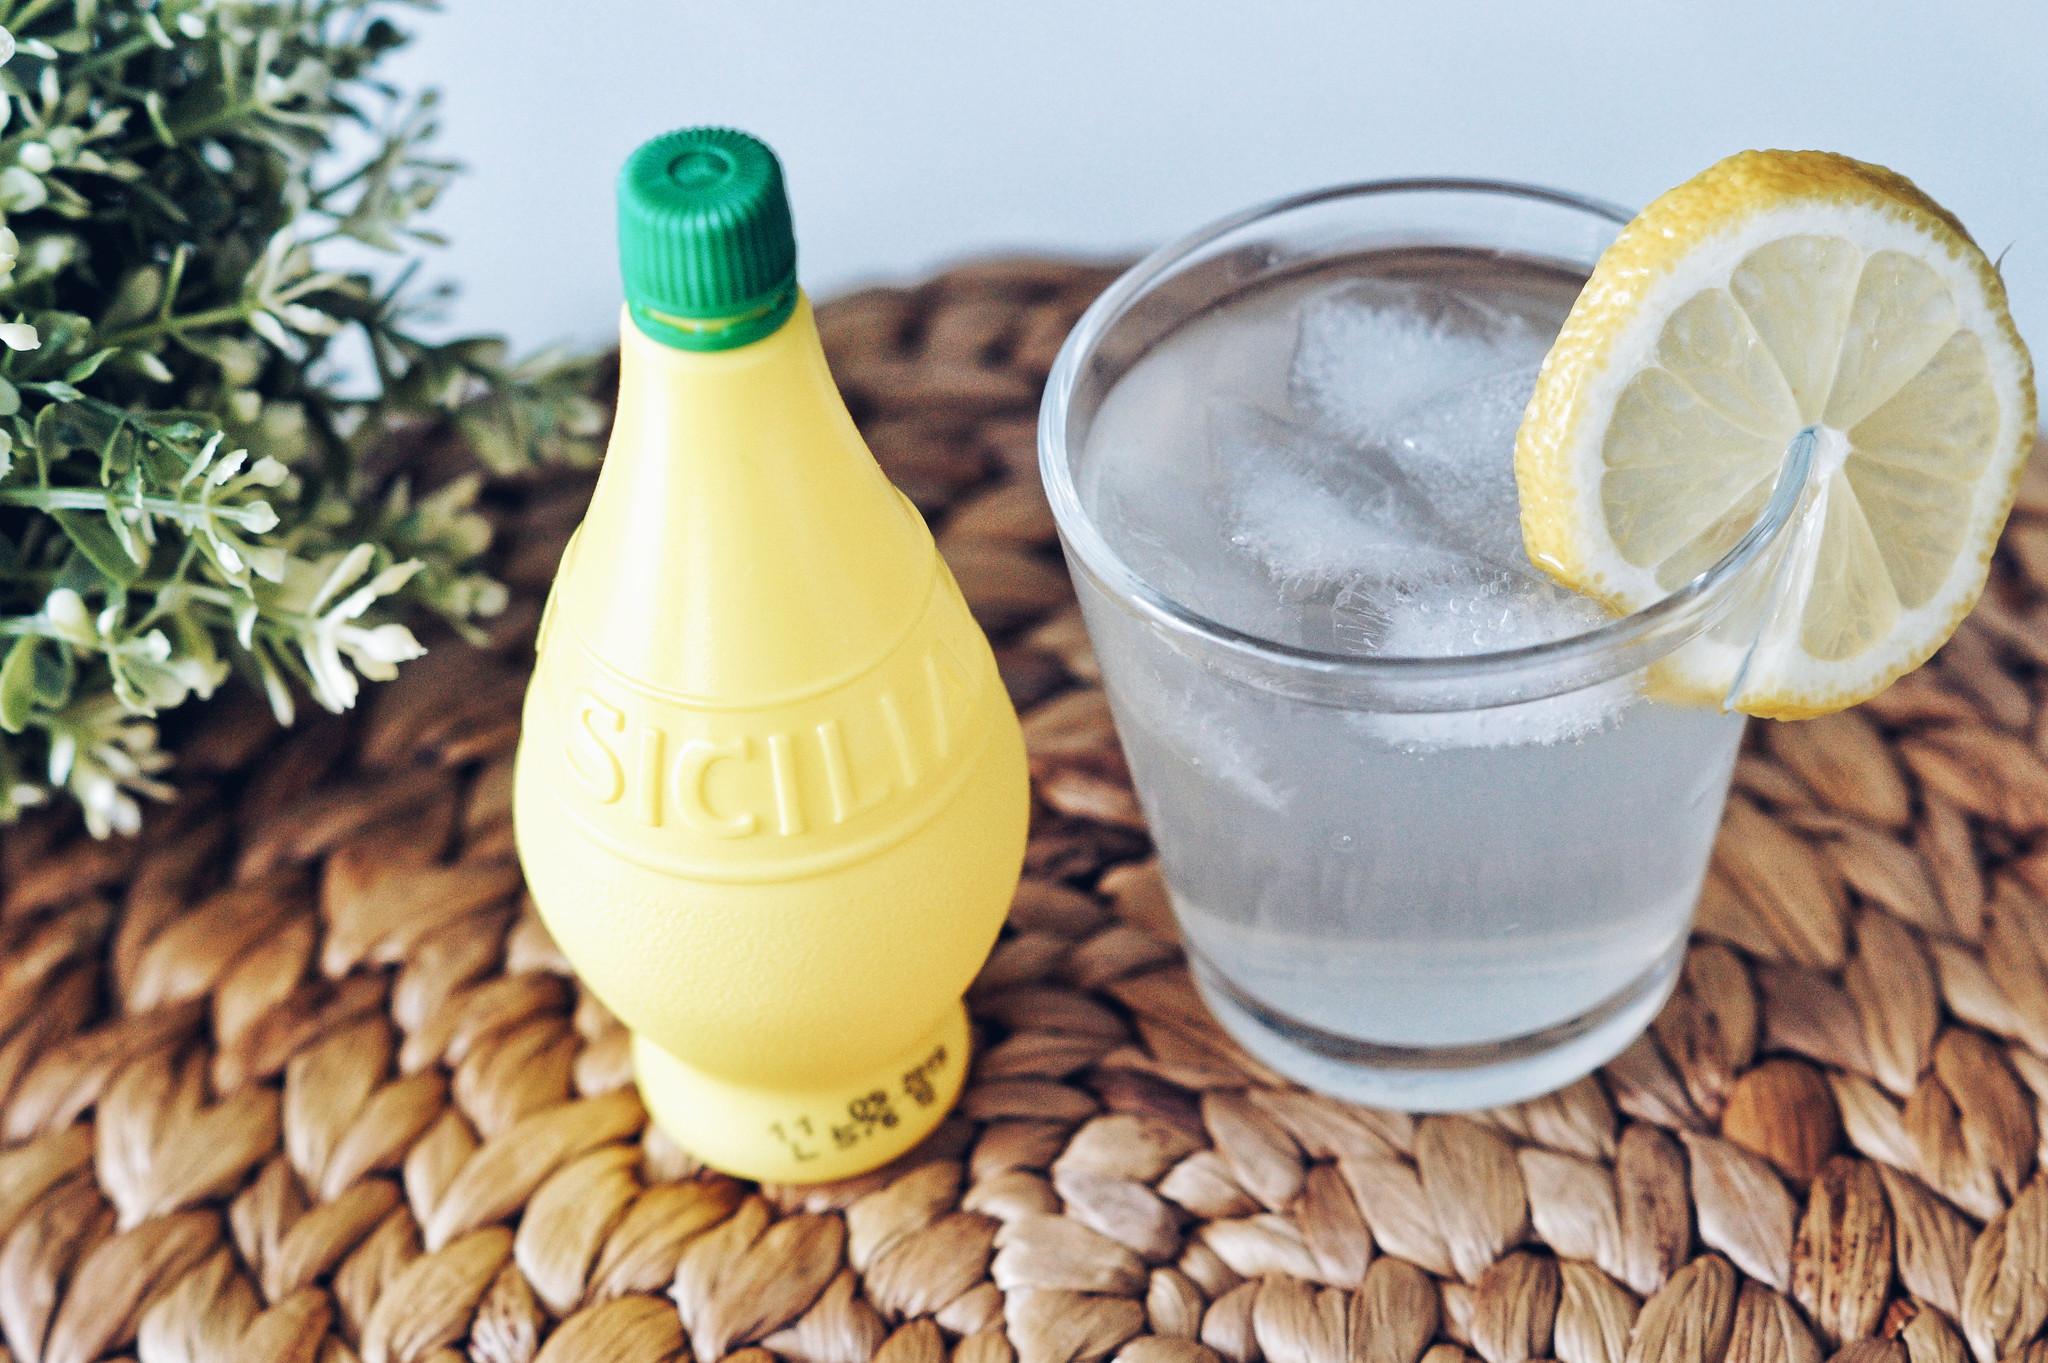 helppo_juoma_kesähelteille